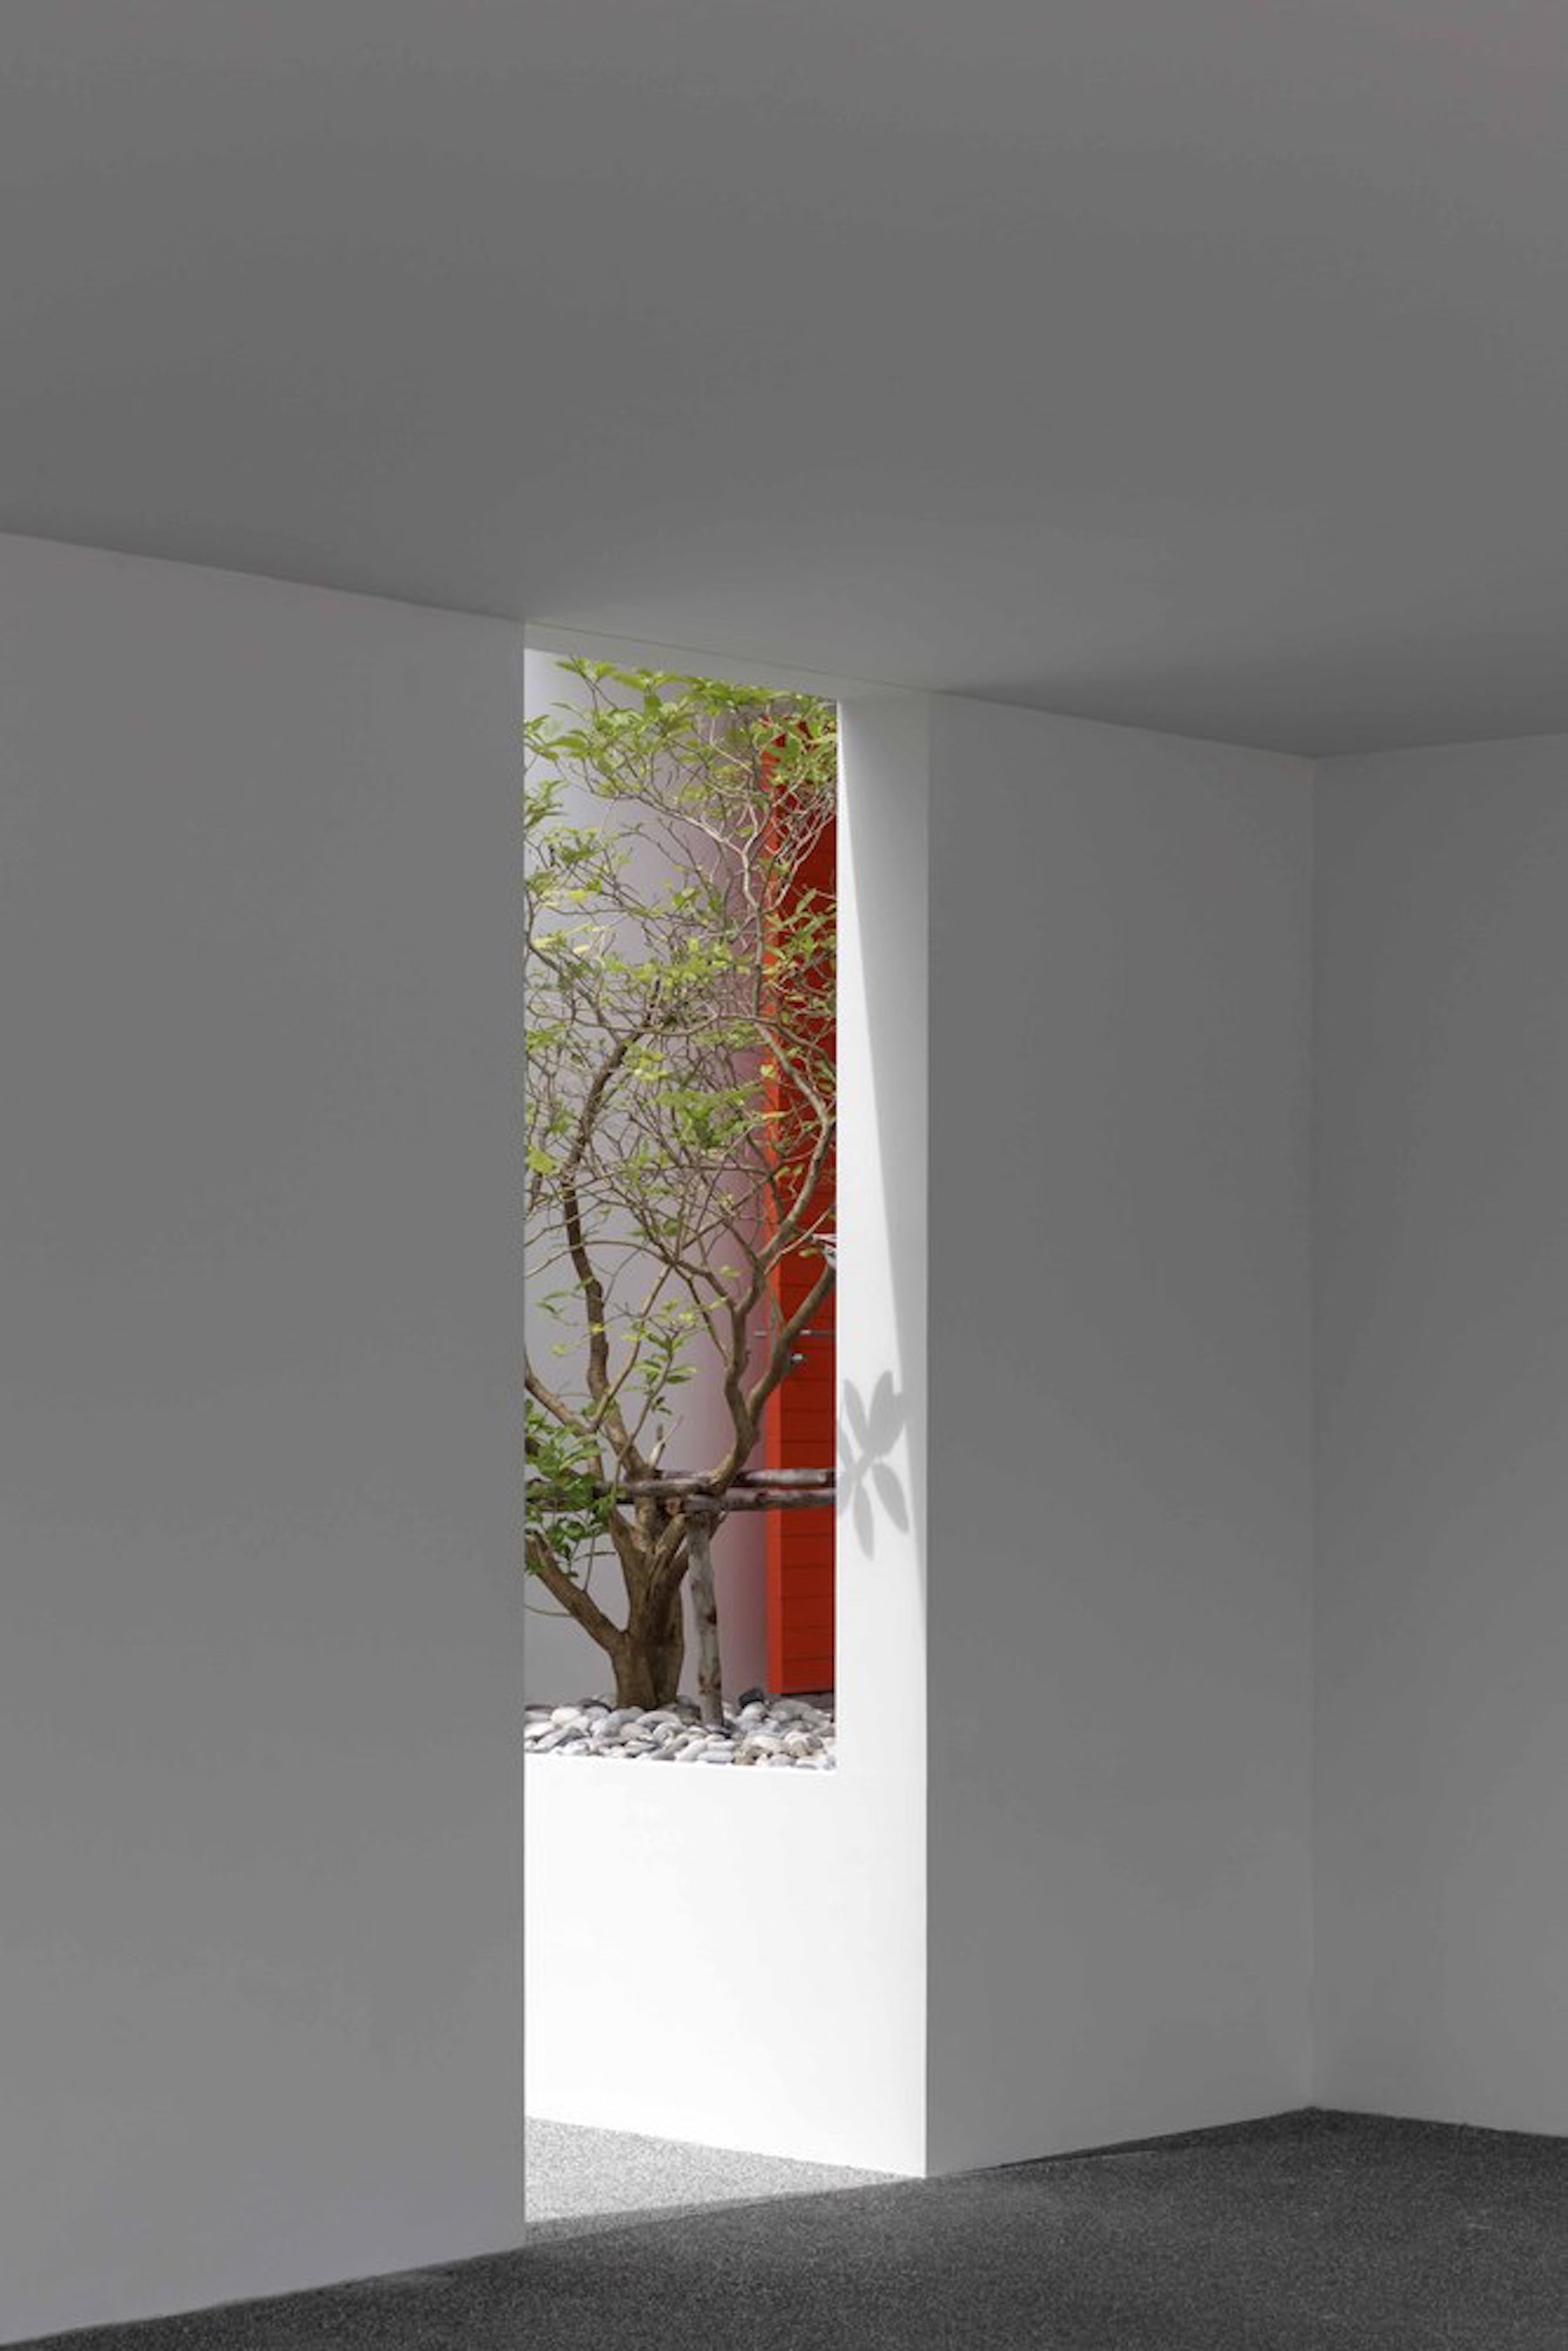 iGNANT-Architecture-Ayutt-And-Associates-Design-White-Box-House-14